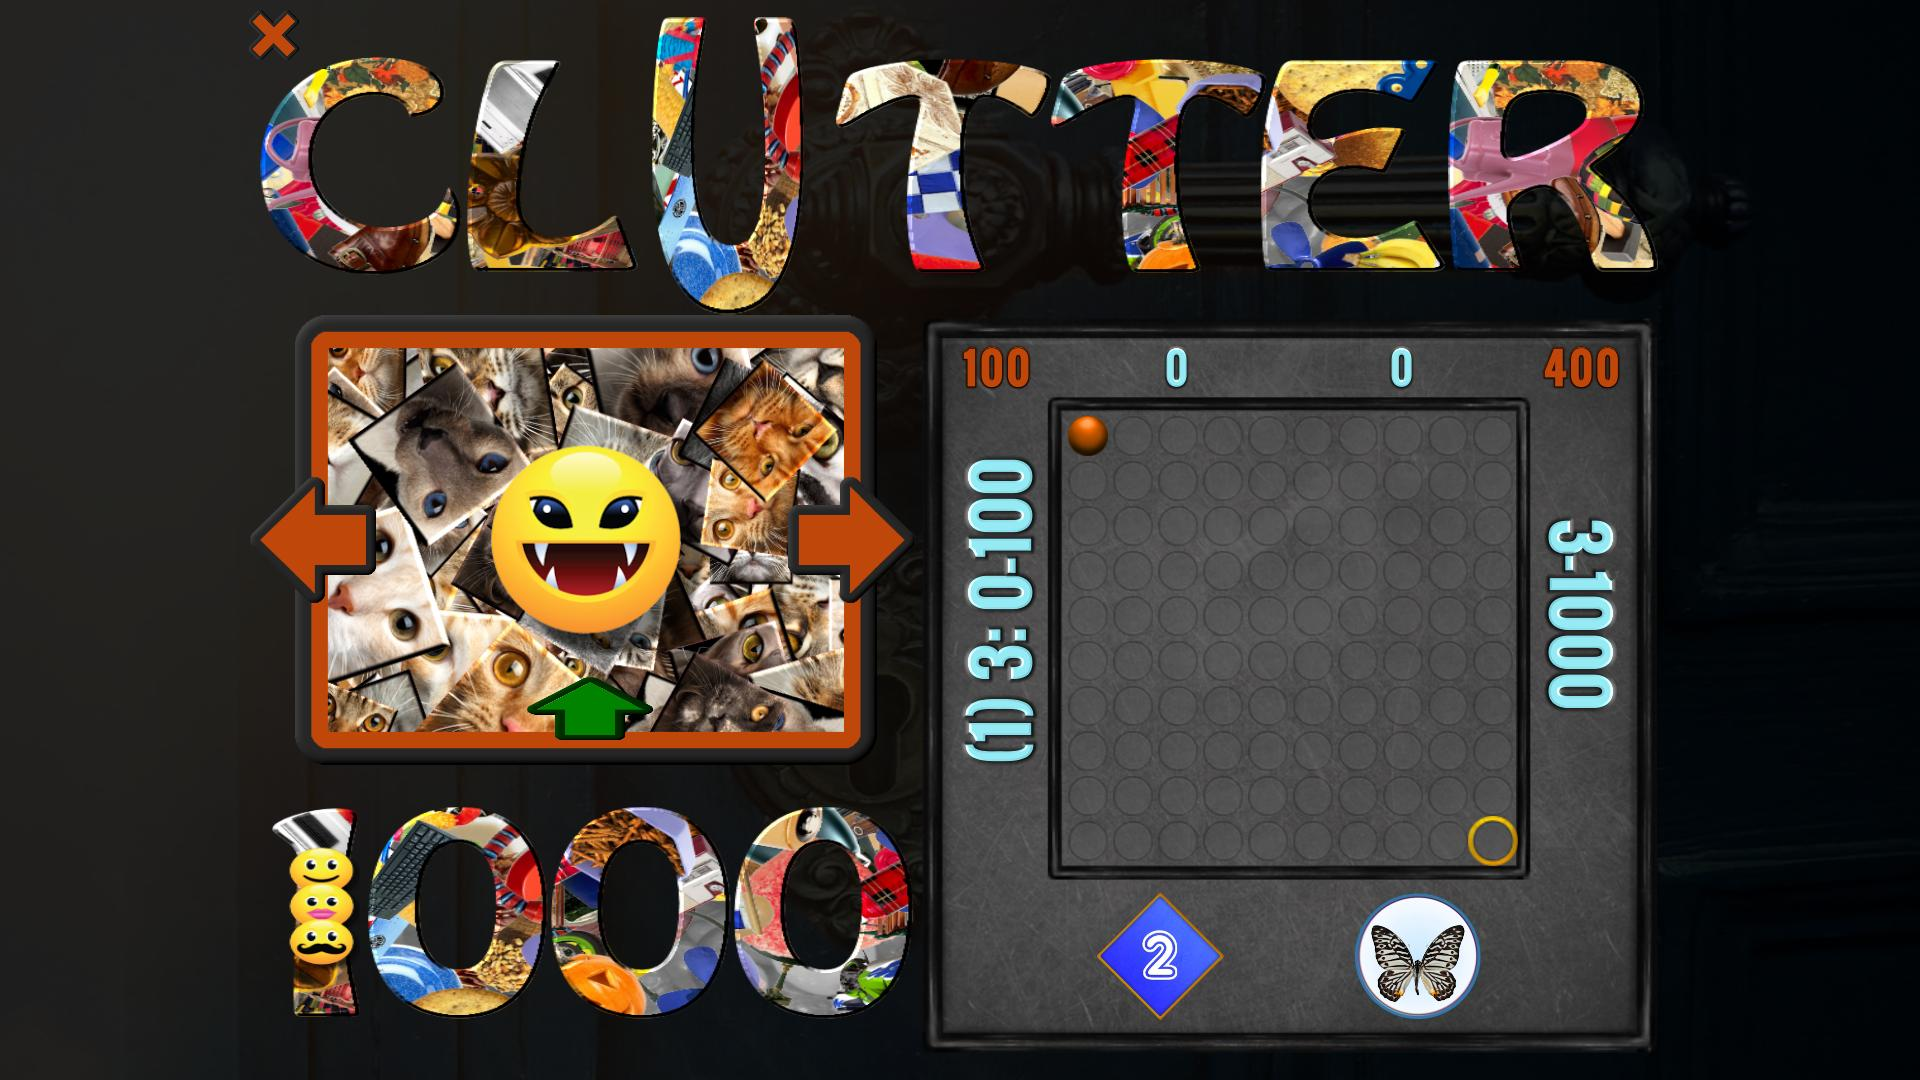 Беспорядок 1000 | Clutter 1000 (En)